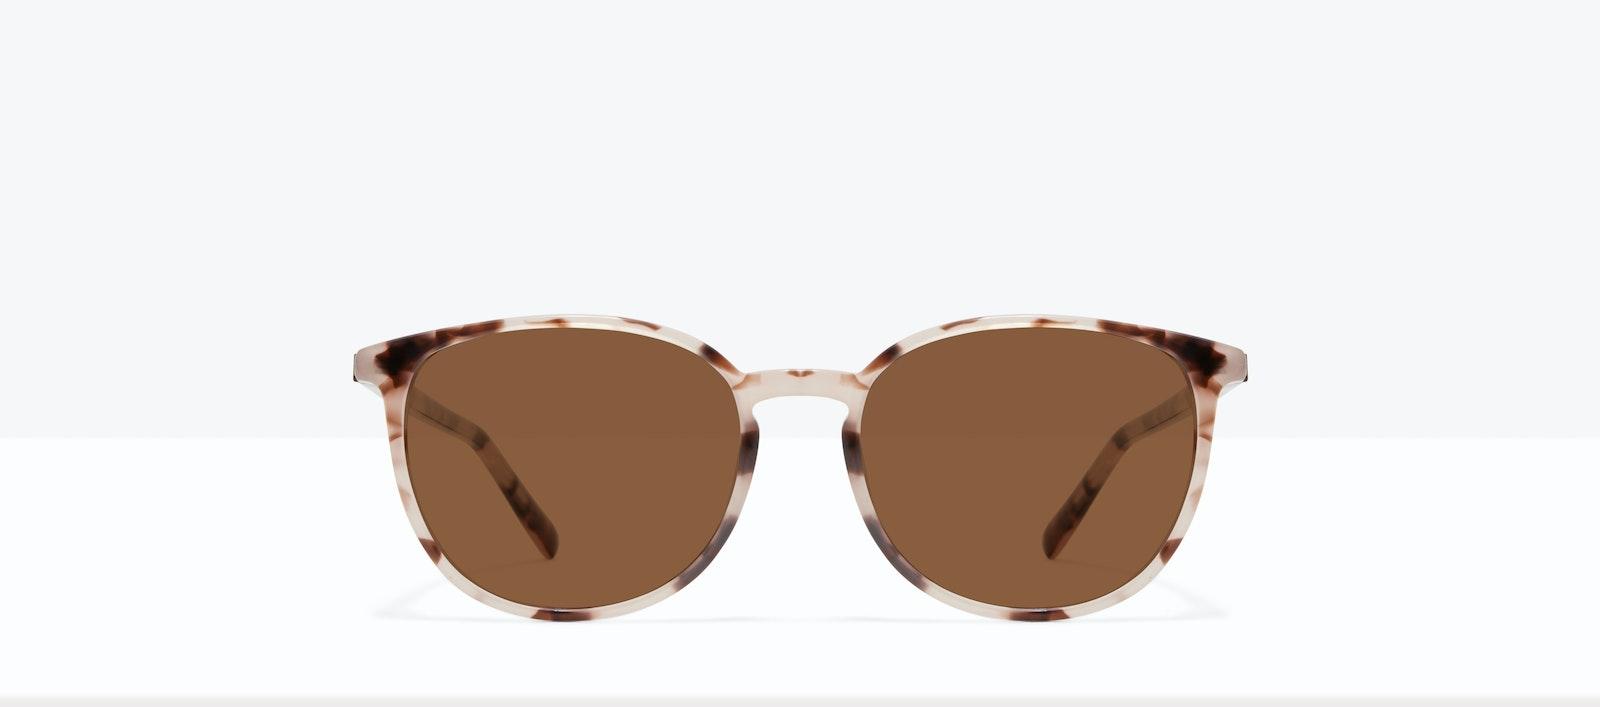 Affordable Fashion Glasses Round Sunglasses Women Femme Libre S Erzebeth Front